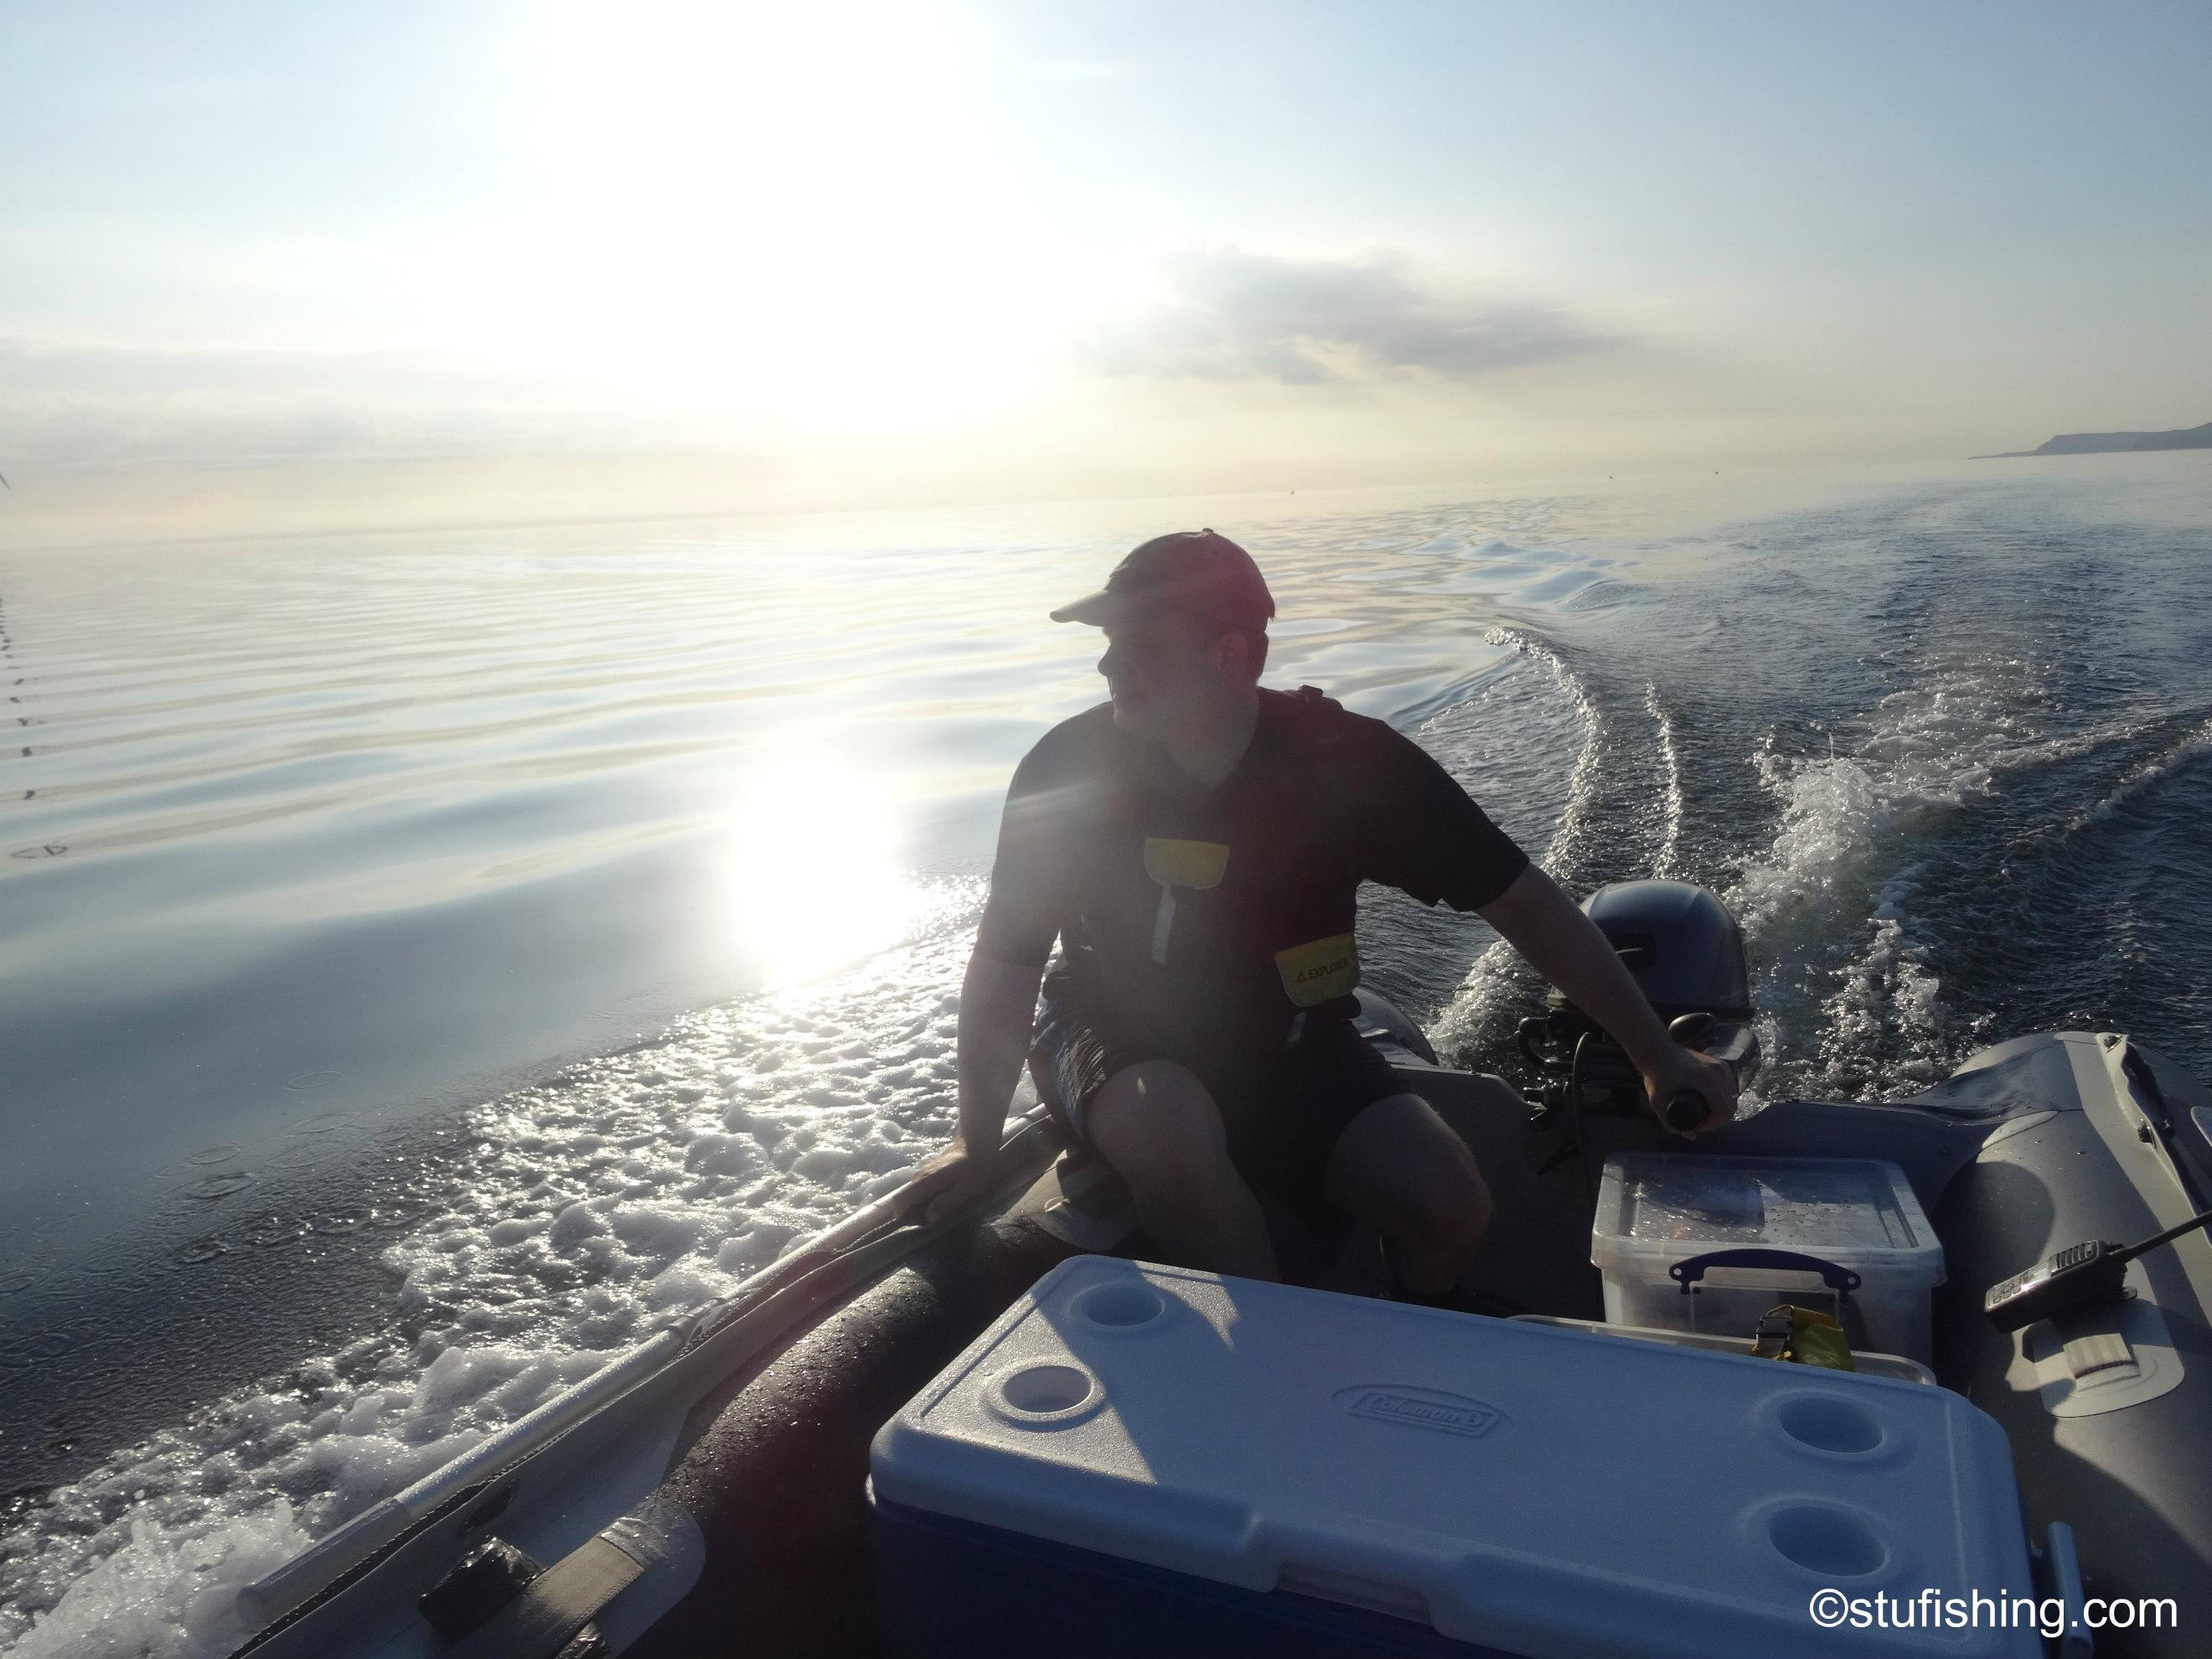 A Sea Fishing Session at Redcar – Bass Fishing